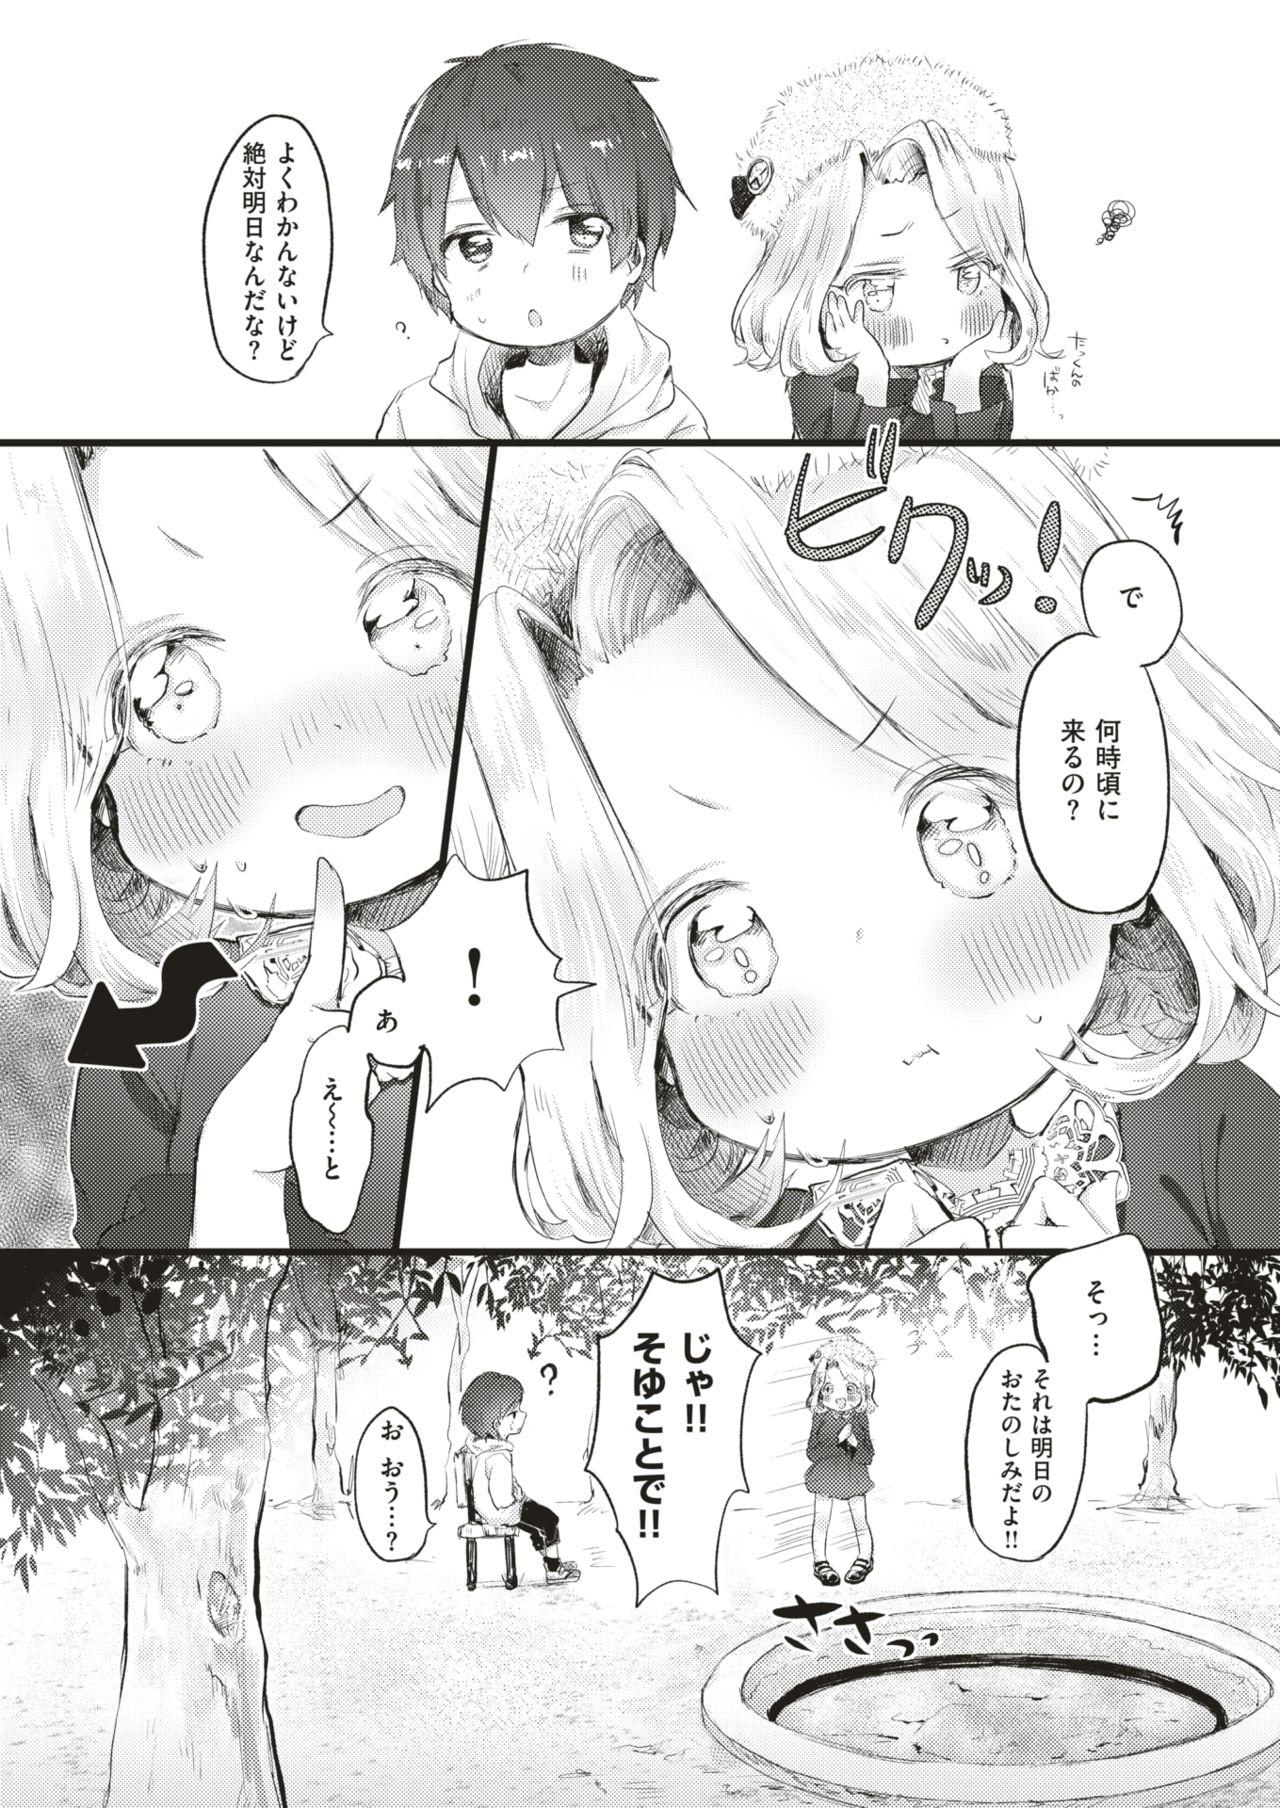 COMIC HAPPINING Vol. 4 81